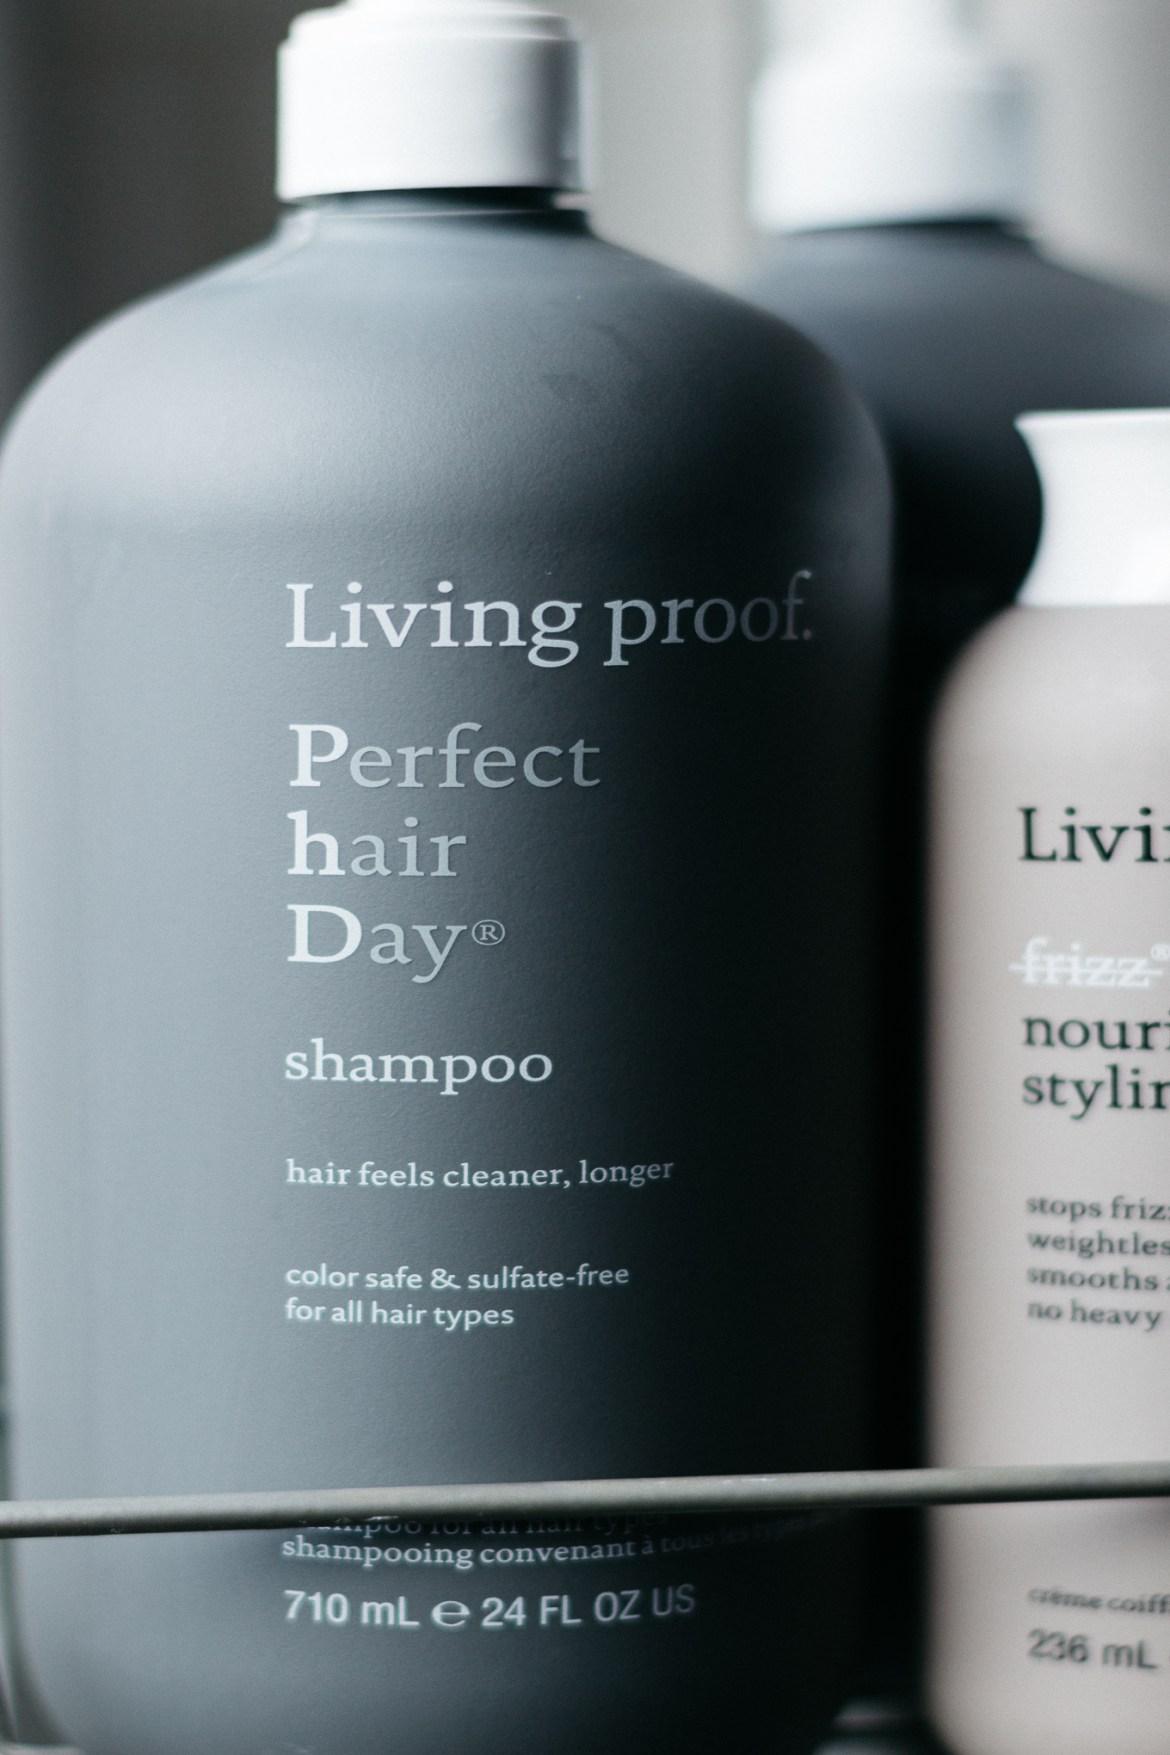 living proof, living proof hair care, jennifer aniston hair, chris mcmillan salon, mens hair tips